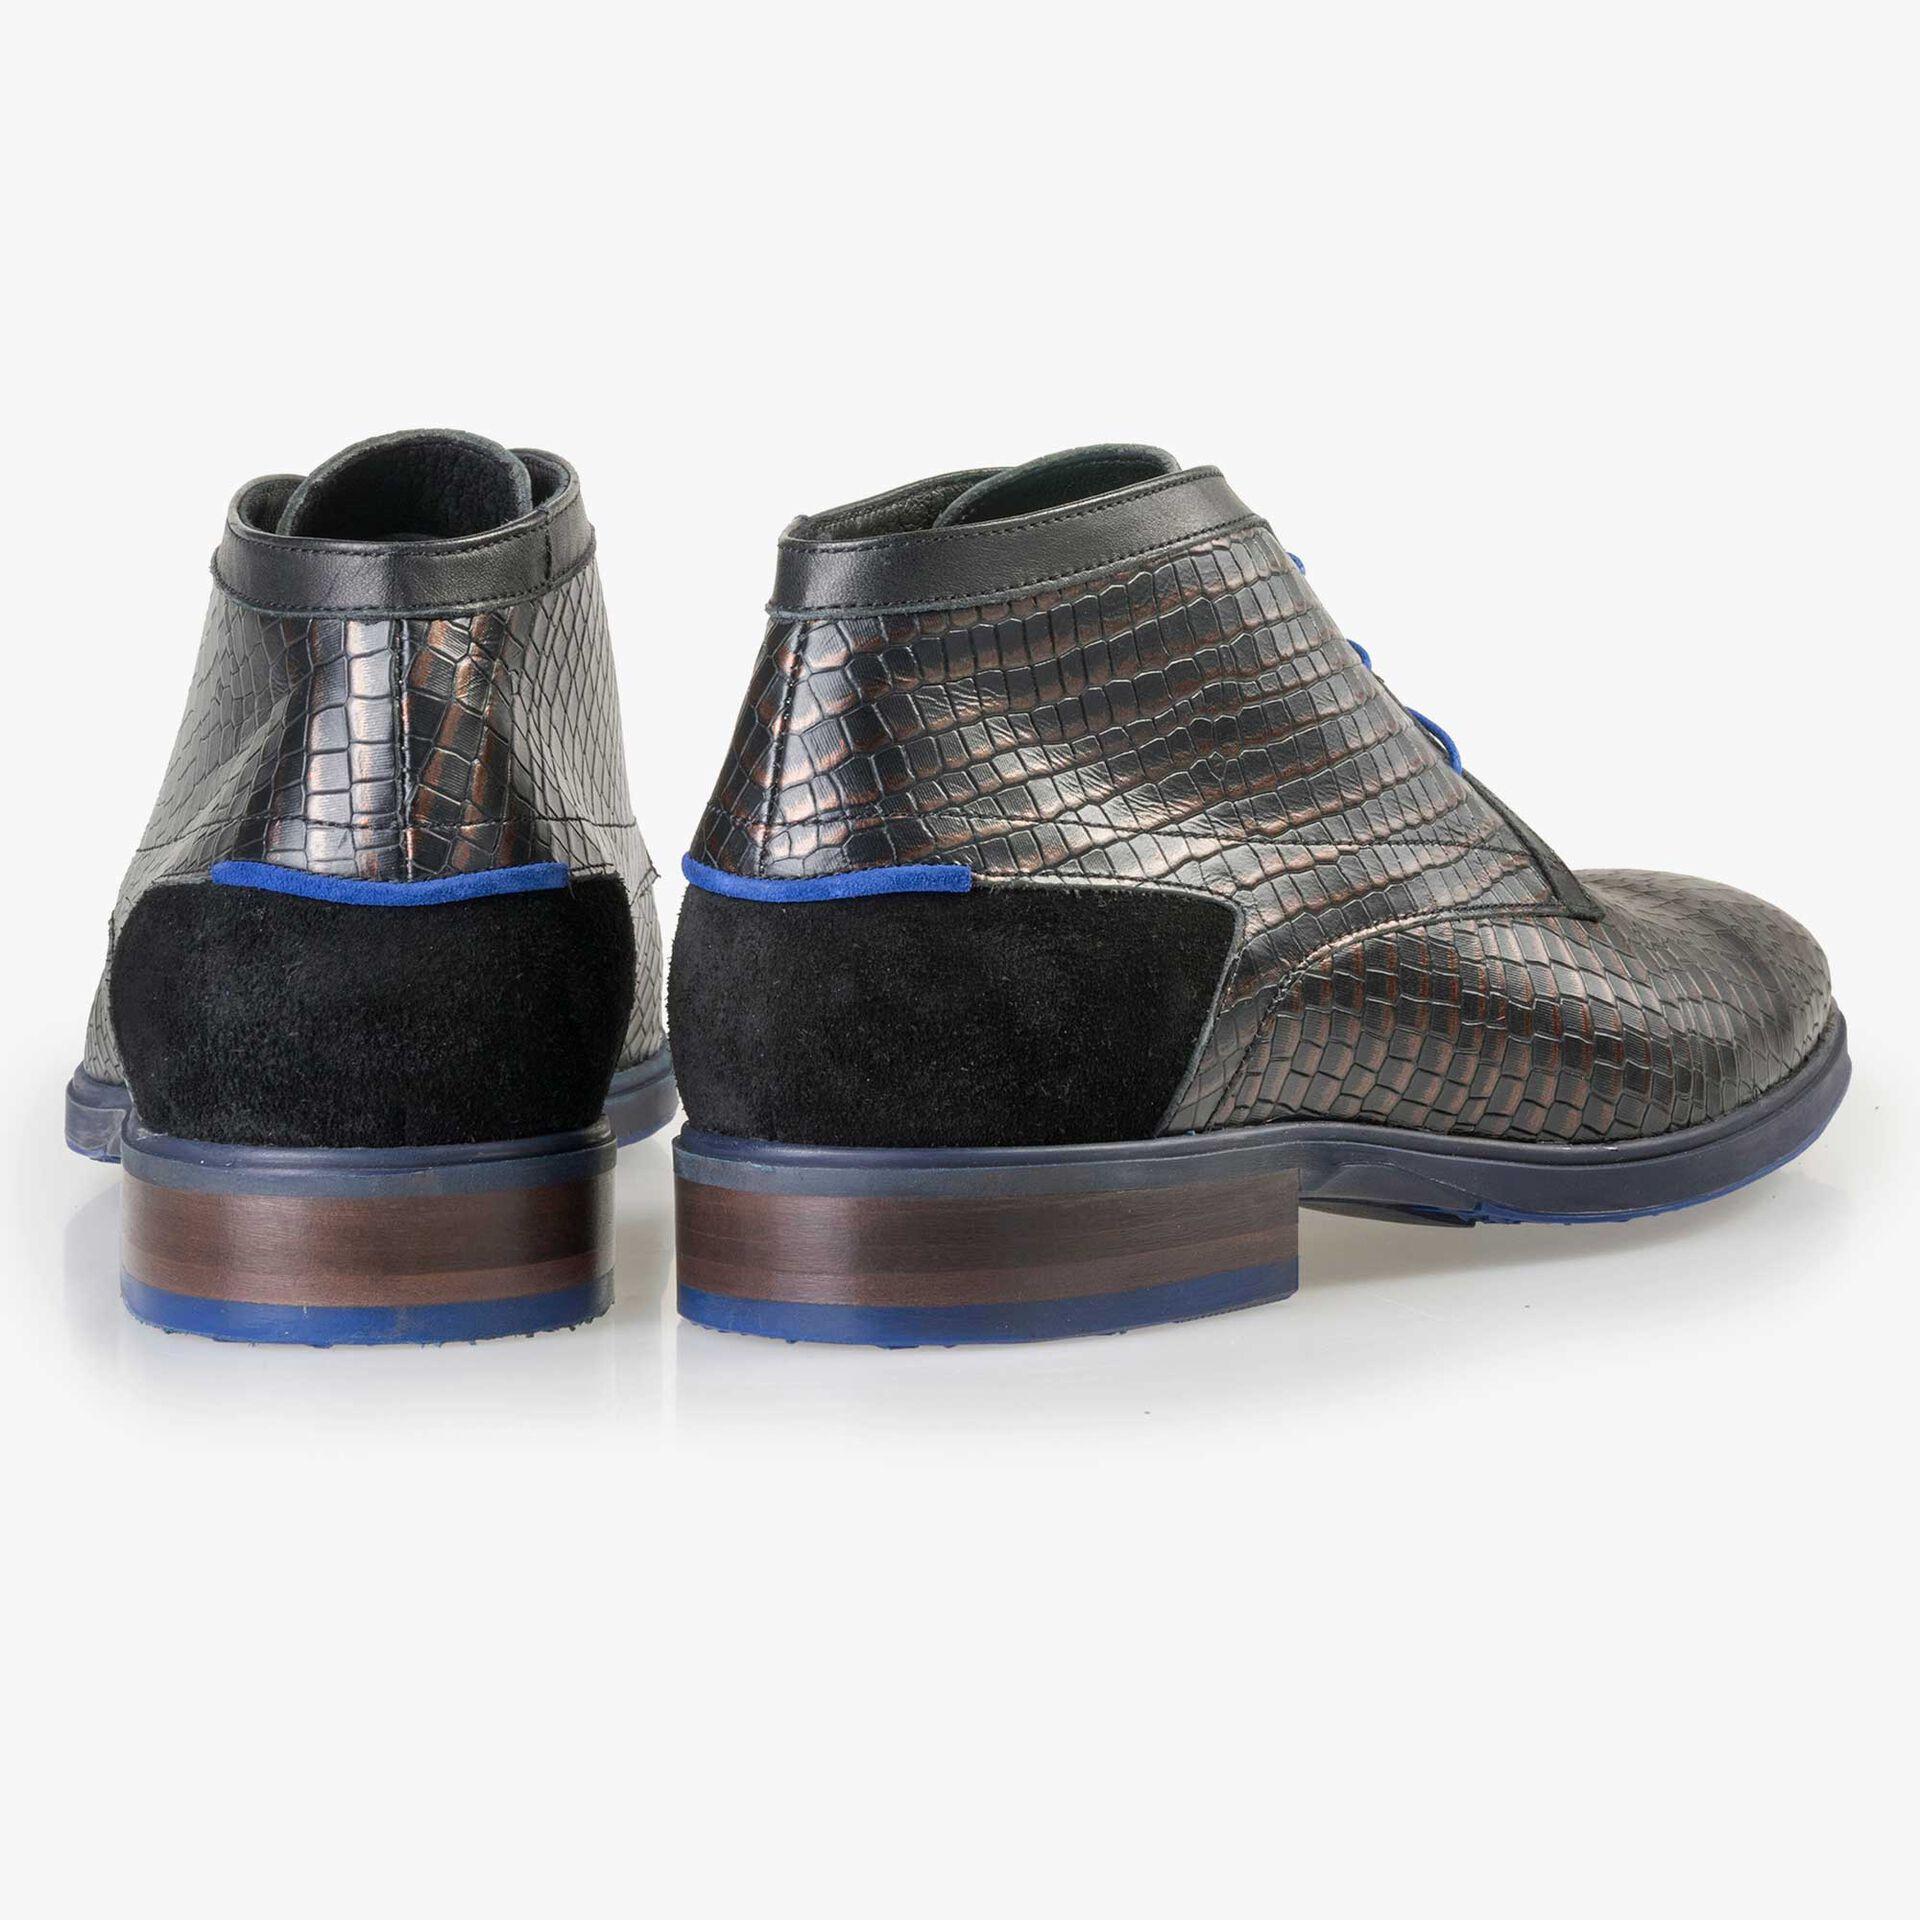 Floris van Bommel men's black leather lace boot with a brown metallic pattern